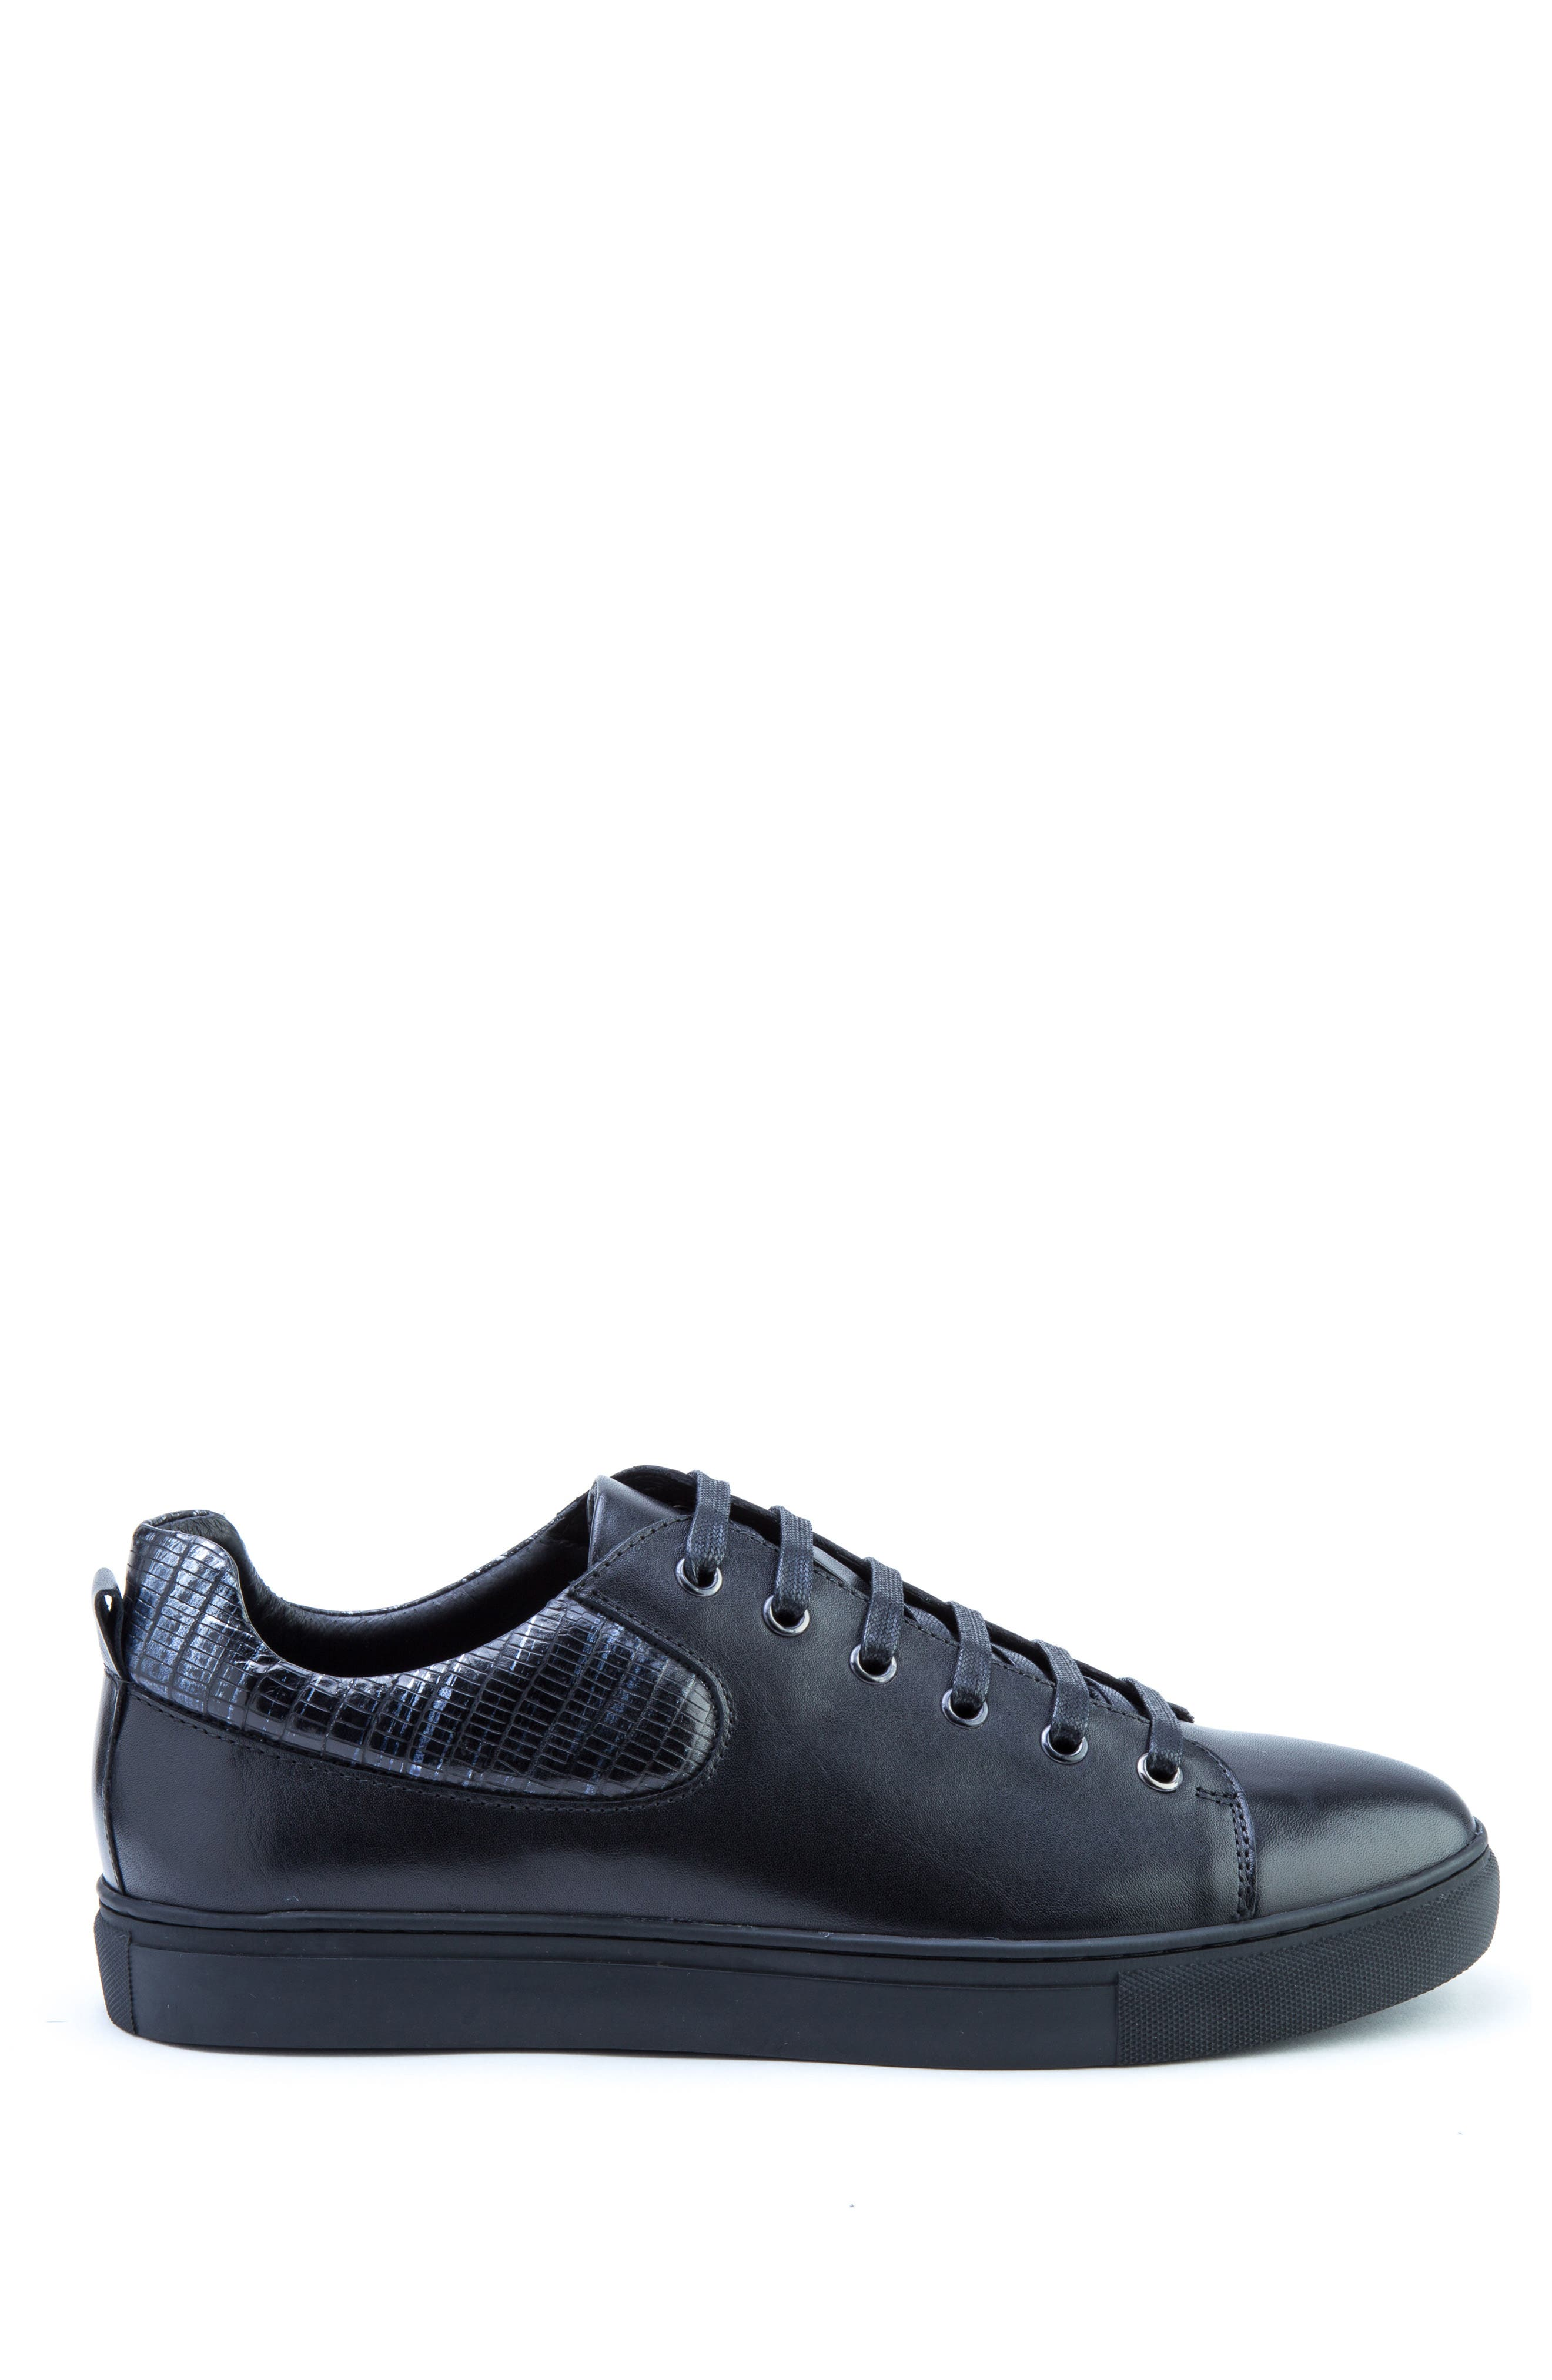 Robinson Sneaker,                             Alternate thumbnail 3, color,                             Black Leather